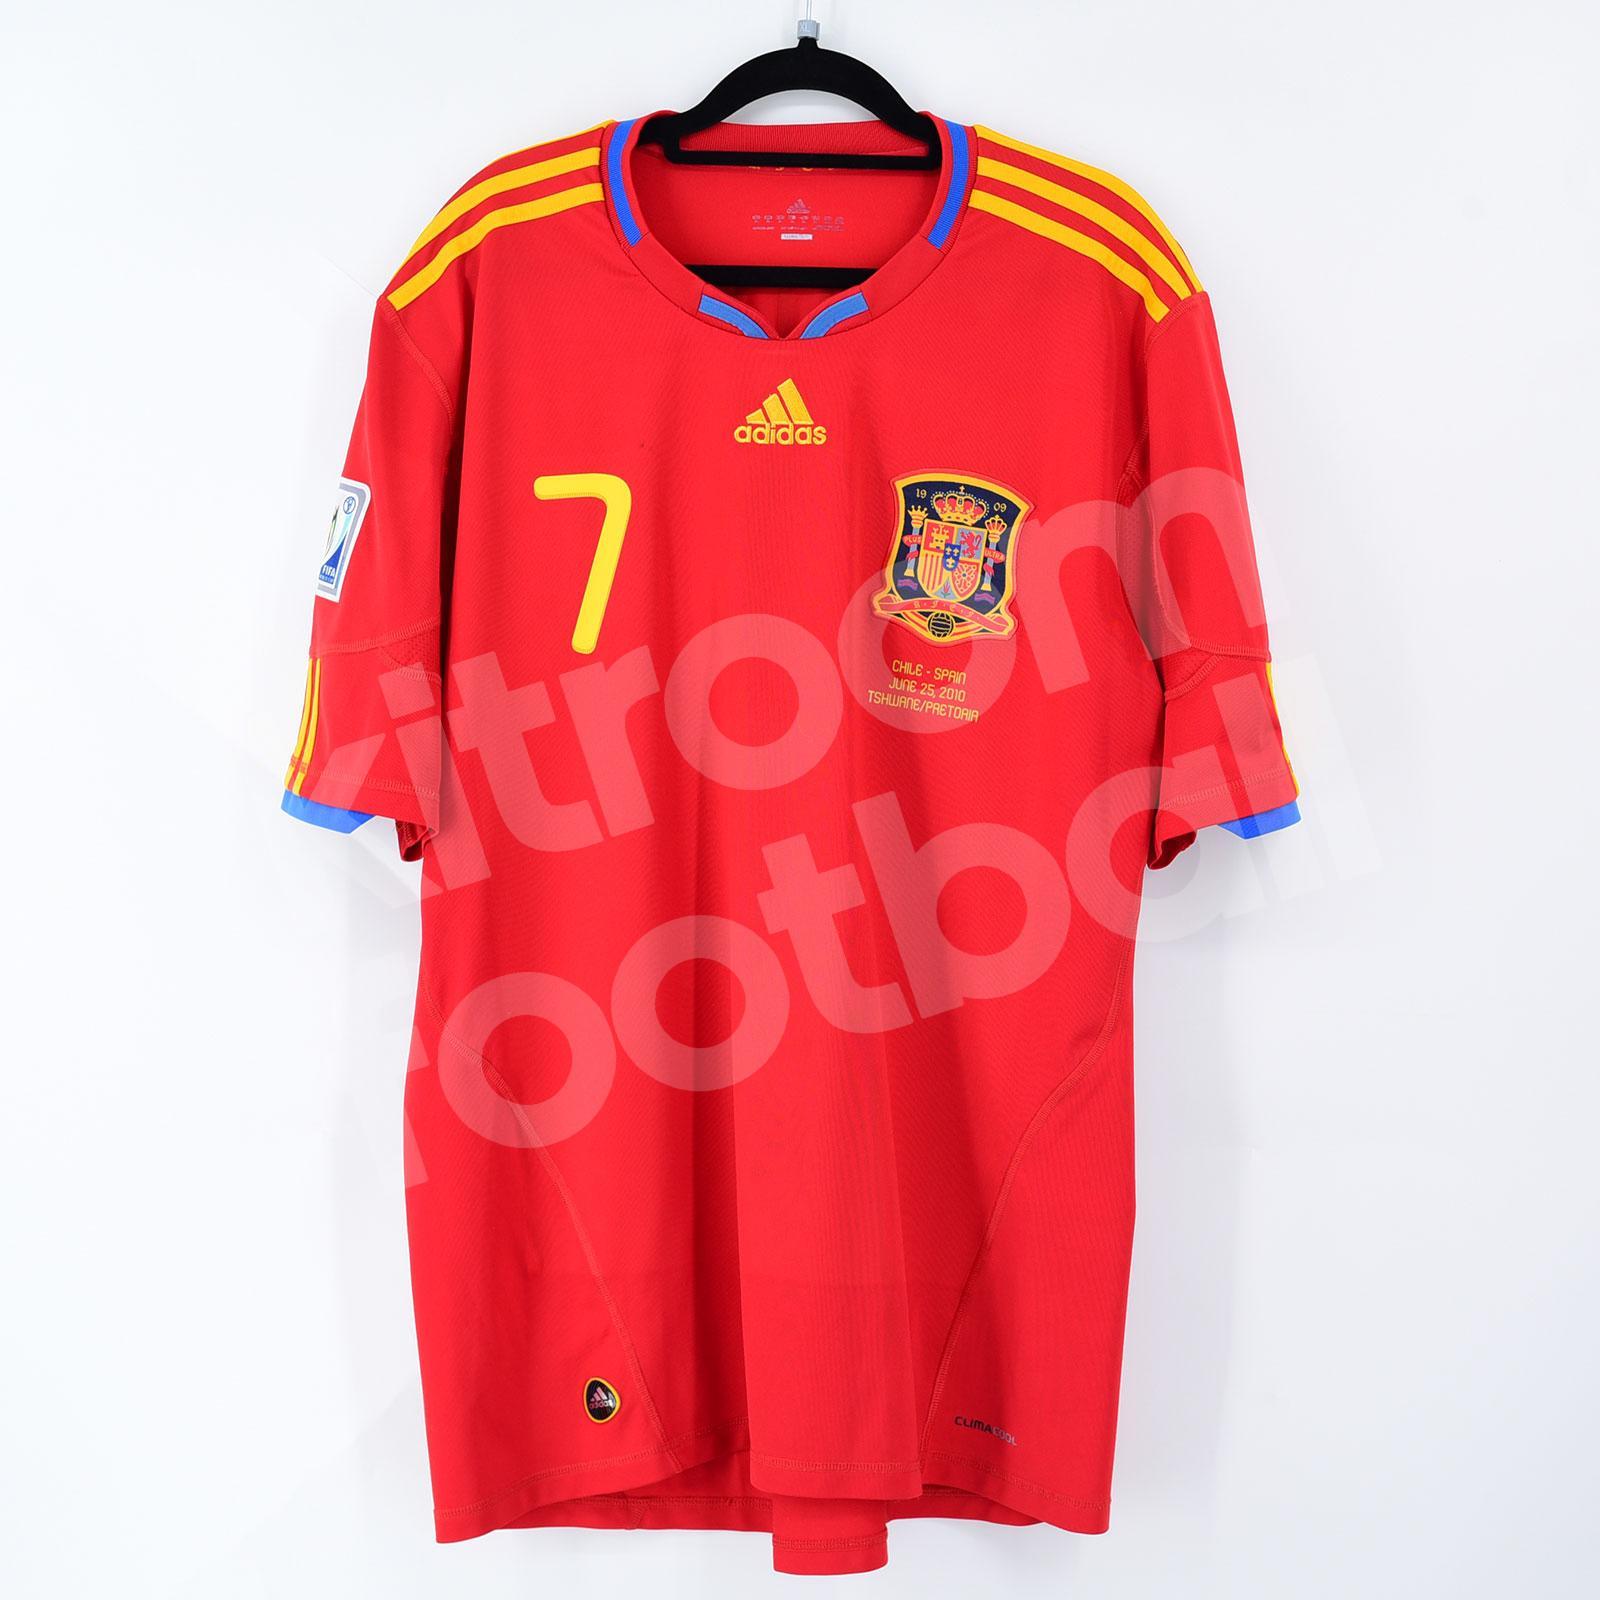 World Cup 2010 South Africa Spain Away Shirt #7 DAVID VILLA (Very Good) XL Adidas vs Chile